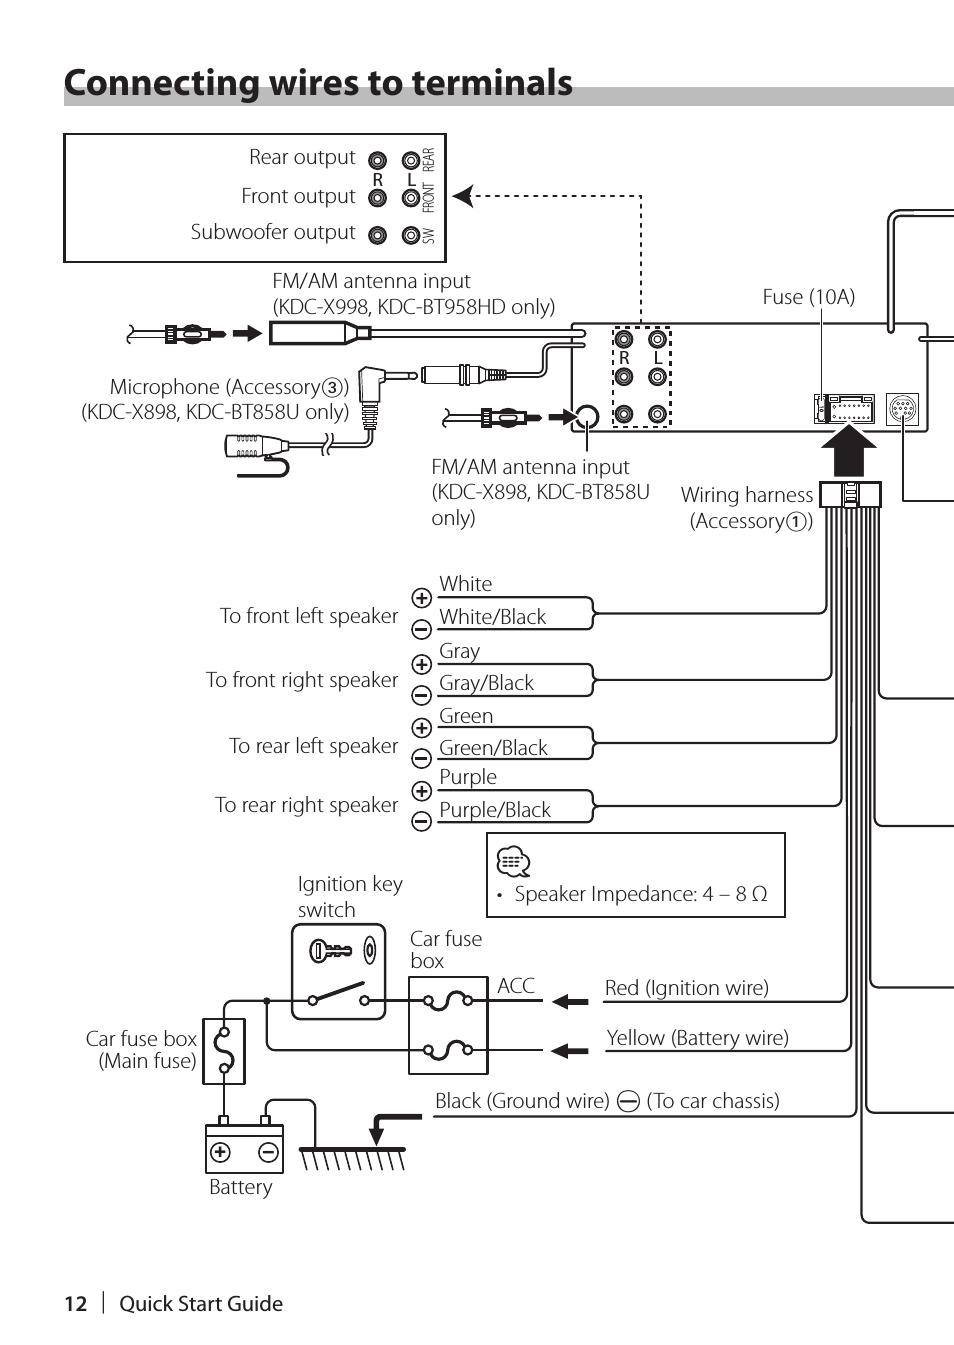 Kenwood Model Kdc X595 Speaker Wiring Diagram - 95 99 Chevy Truck Fuse Box  | Bege Wiring Diagram | X595 Wiring Diagram |  | Bege Place Wiring Diagram - Bege Wiring Diagram